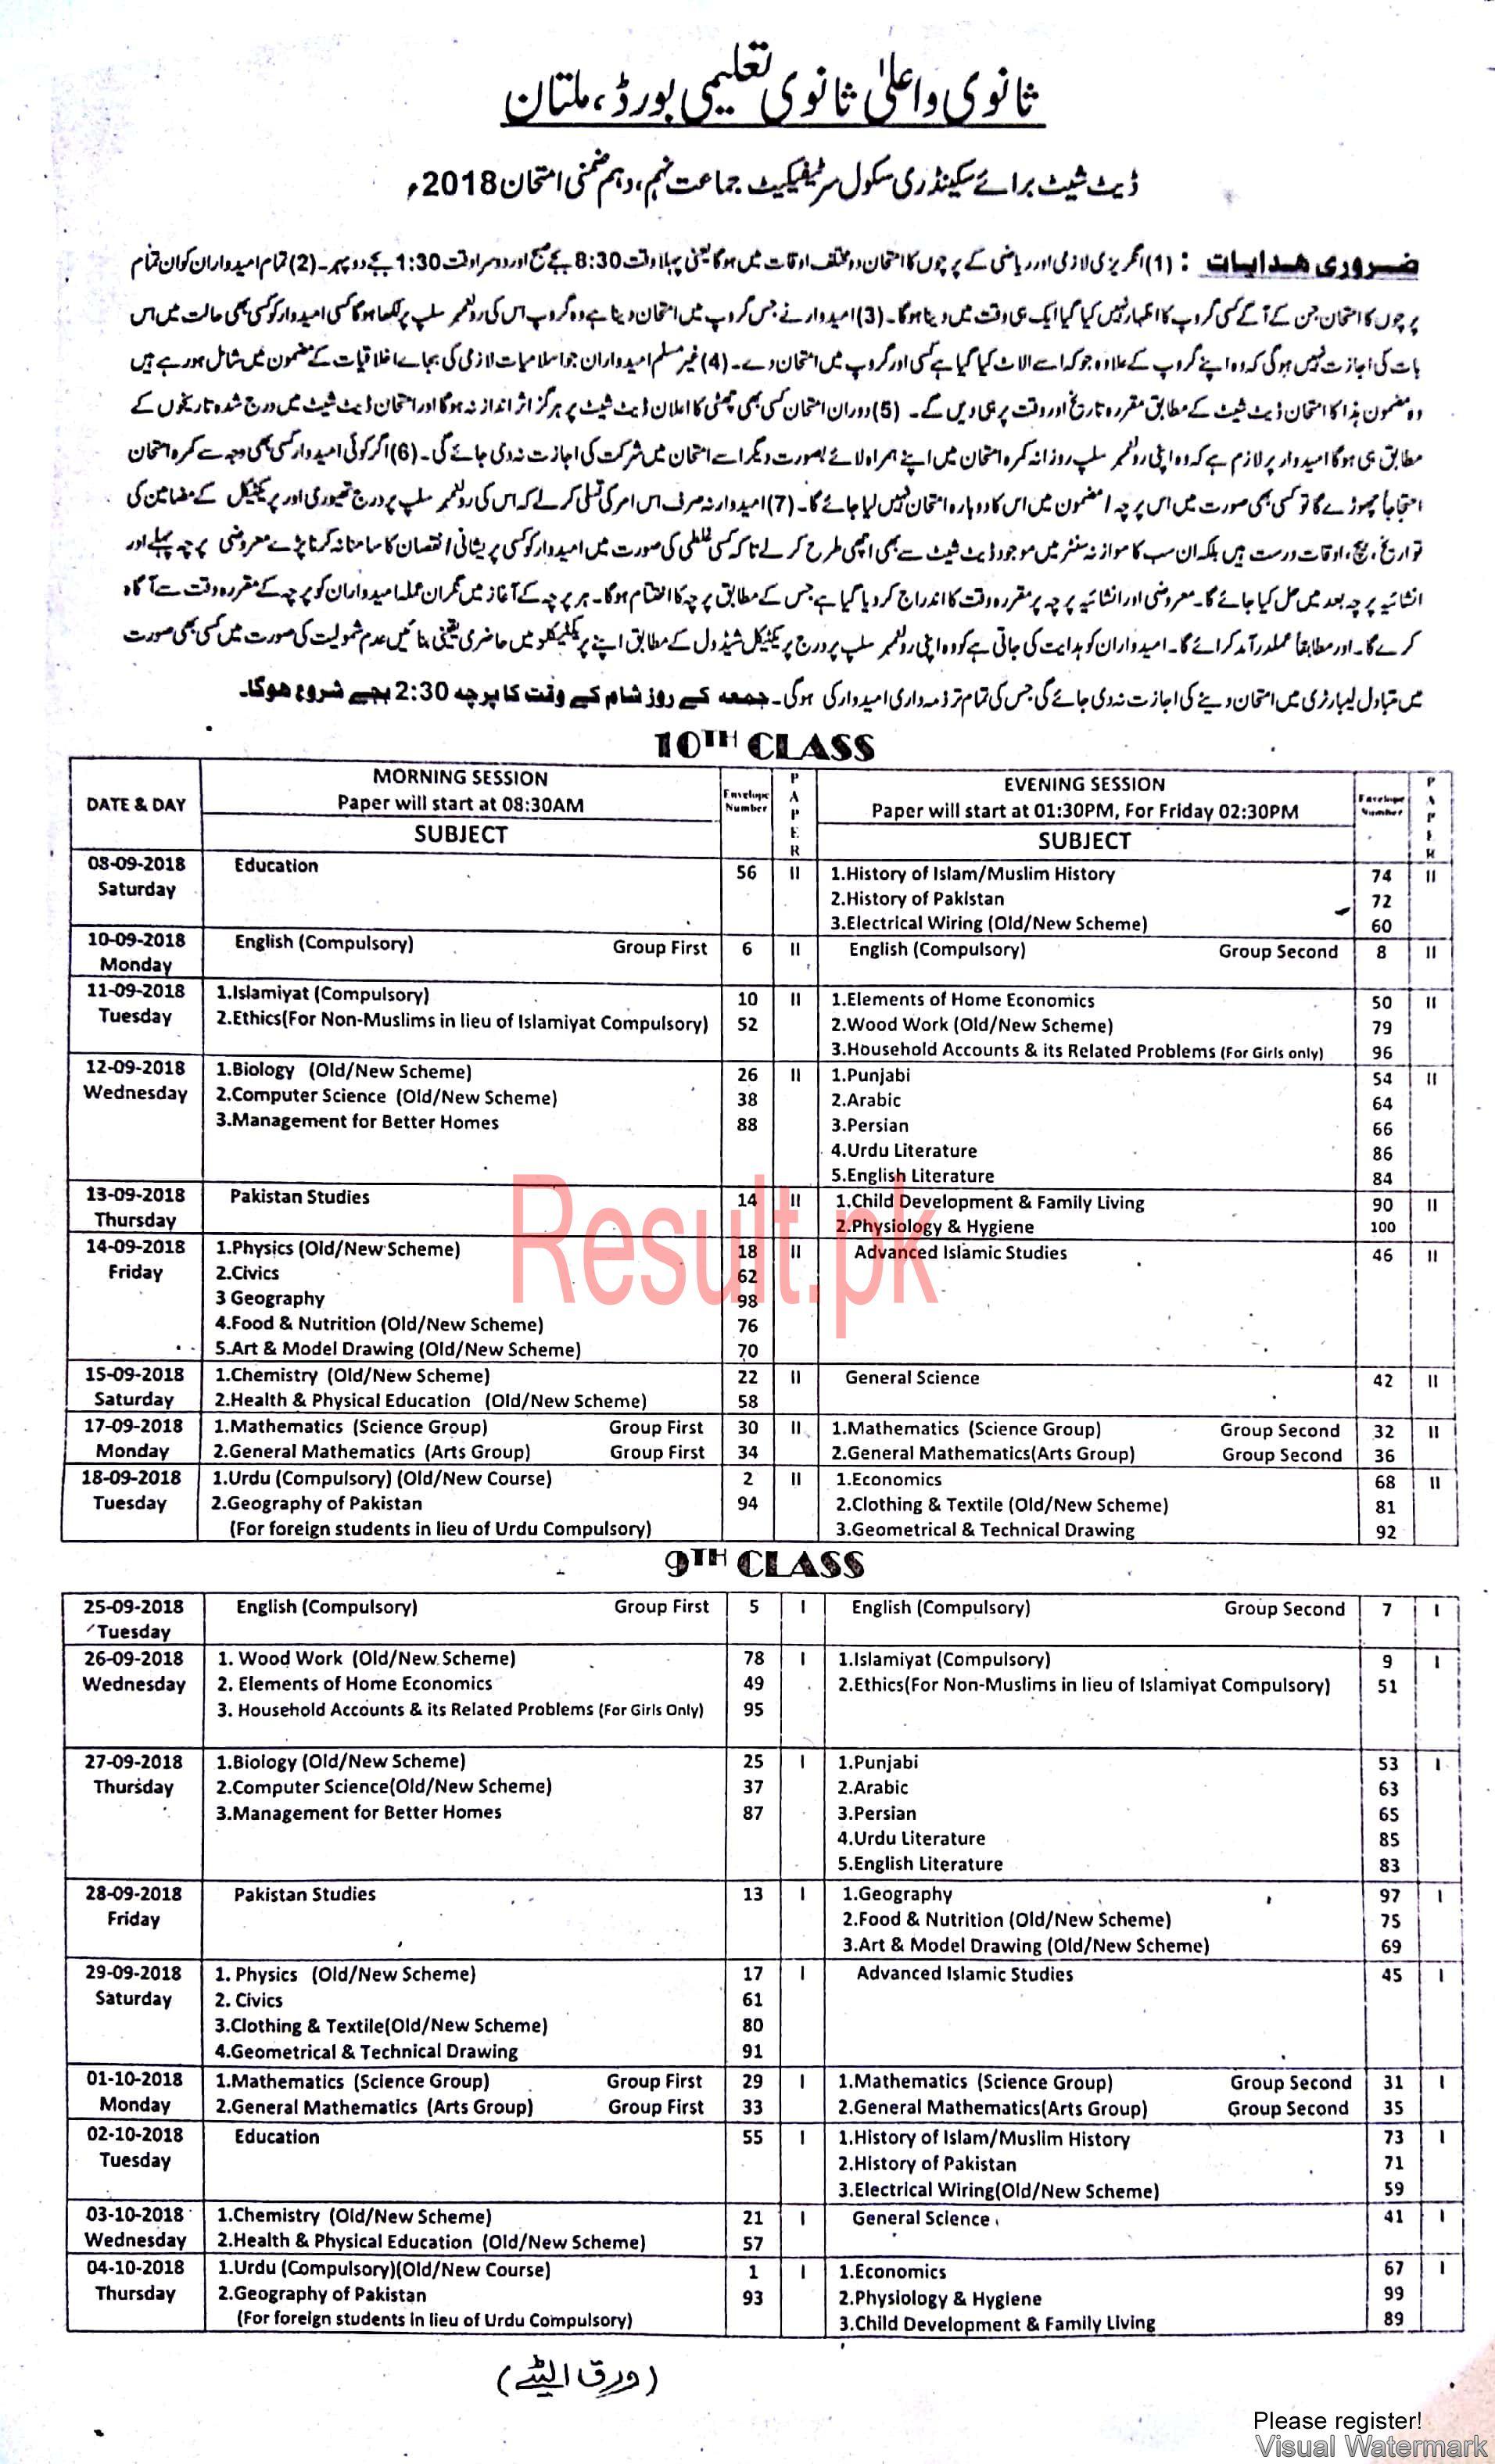 BISE Sargodha Board Date Sheet 2019 Matric Part 1 2, 9th & 10th, SSC